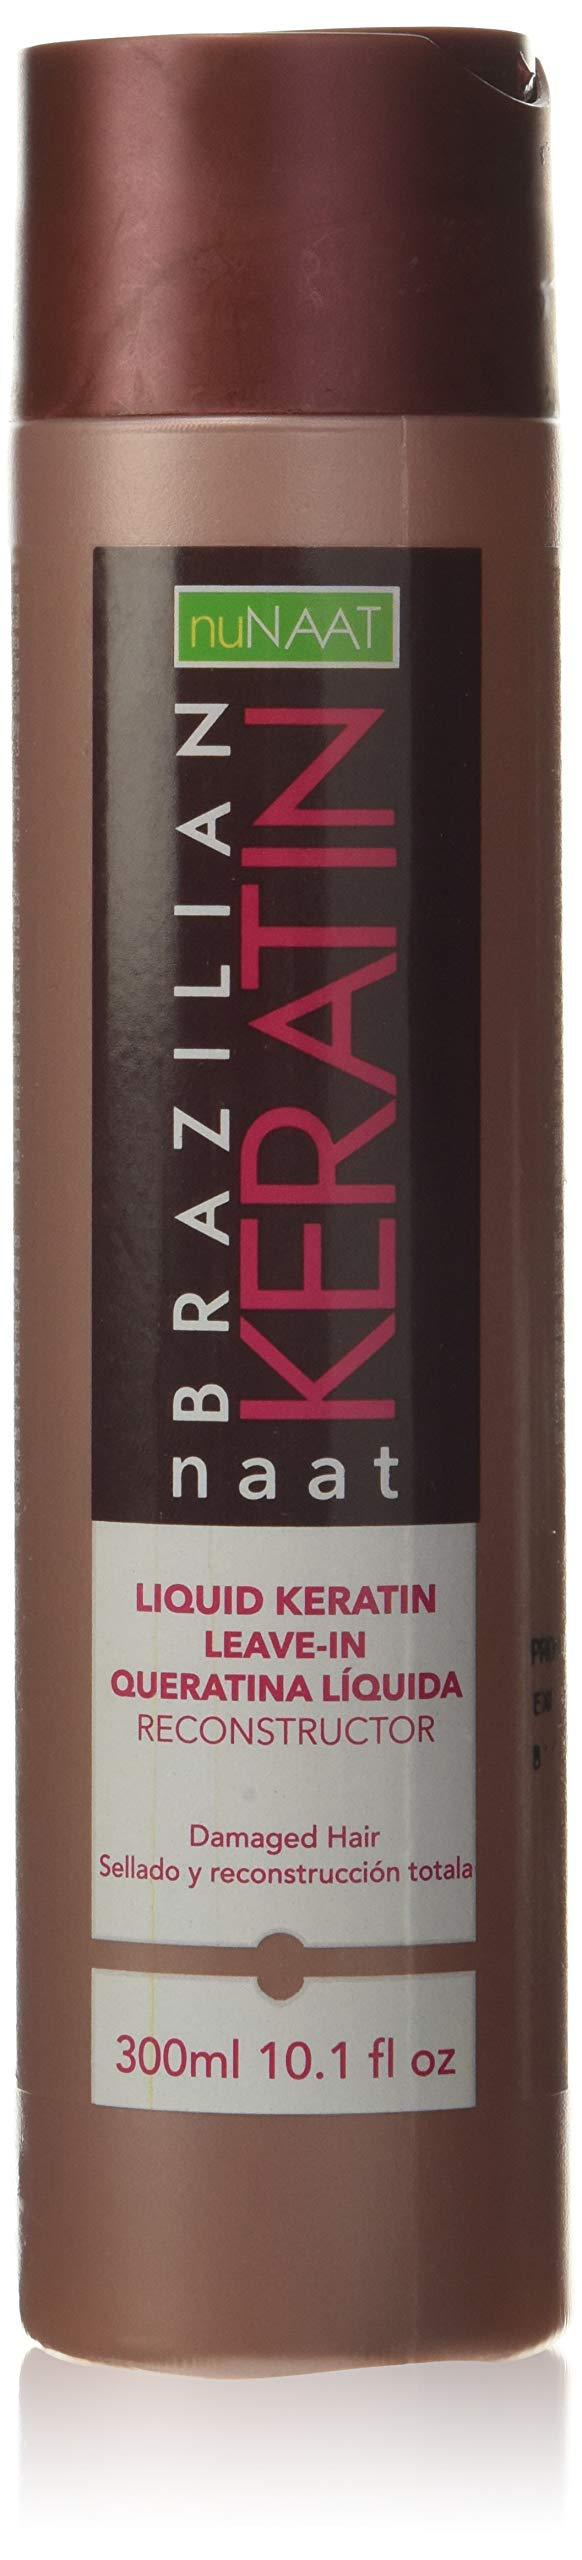 Nunaat Naat Brazilian Keratin Liquid Keratin Leave In Reconstructor, 10.1 fl oz